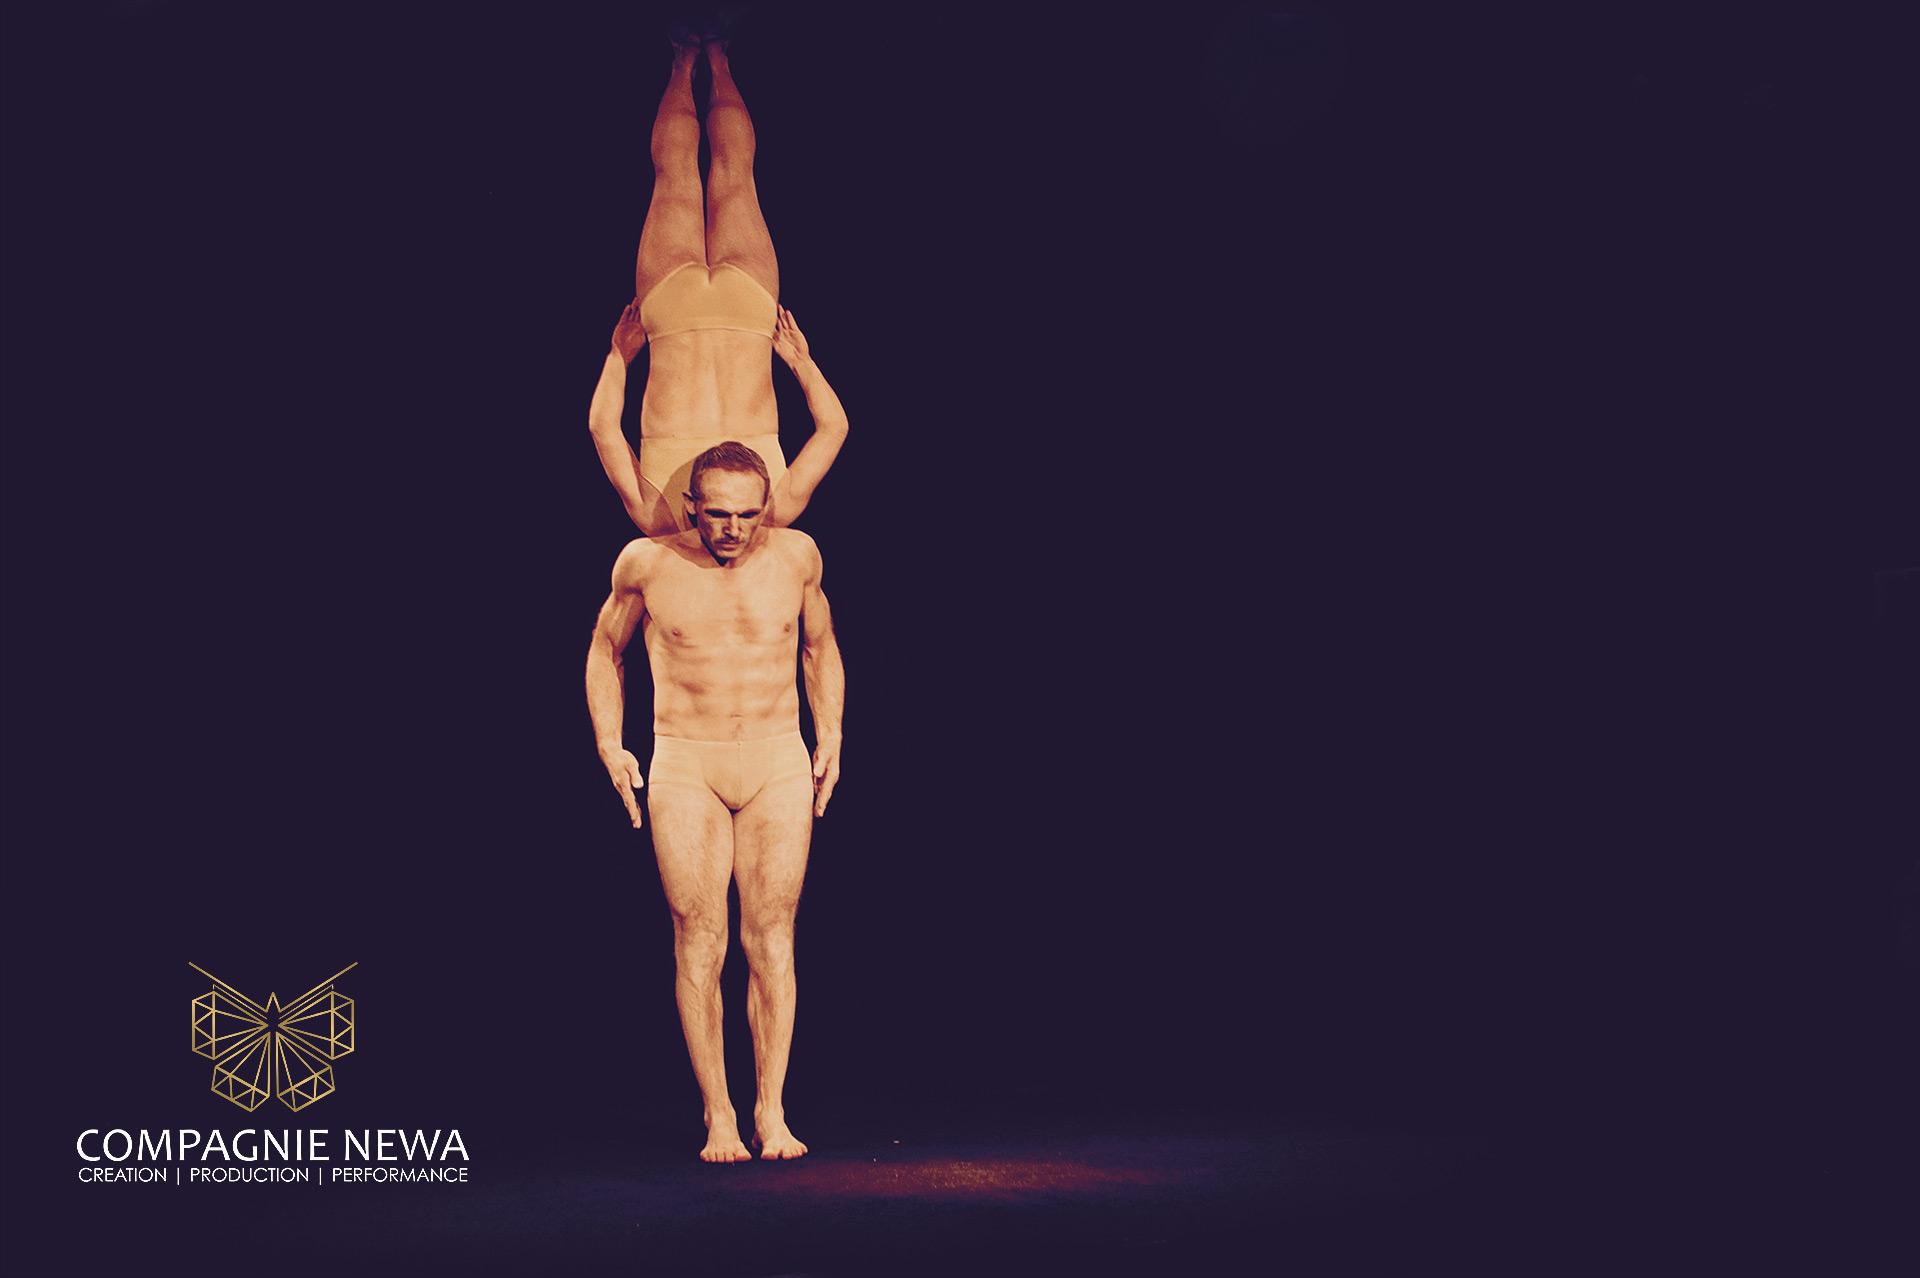 Compagnie_NEWA_acrobatiek_acrobatics_acrogym1